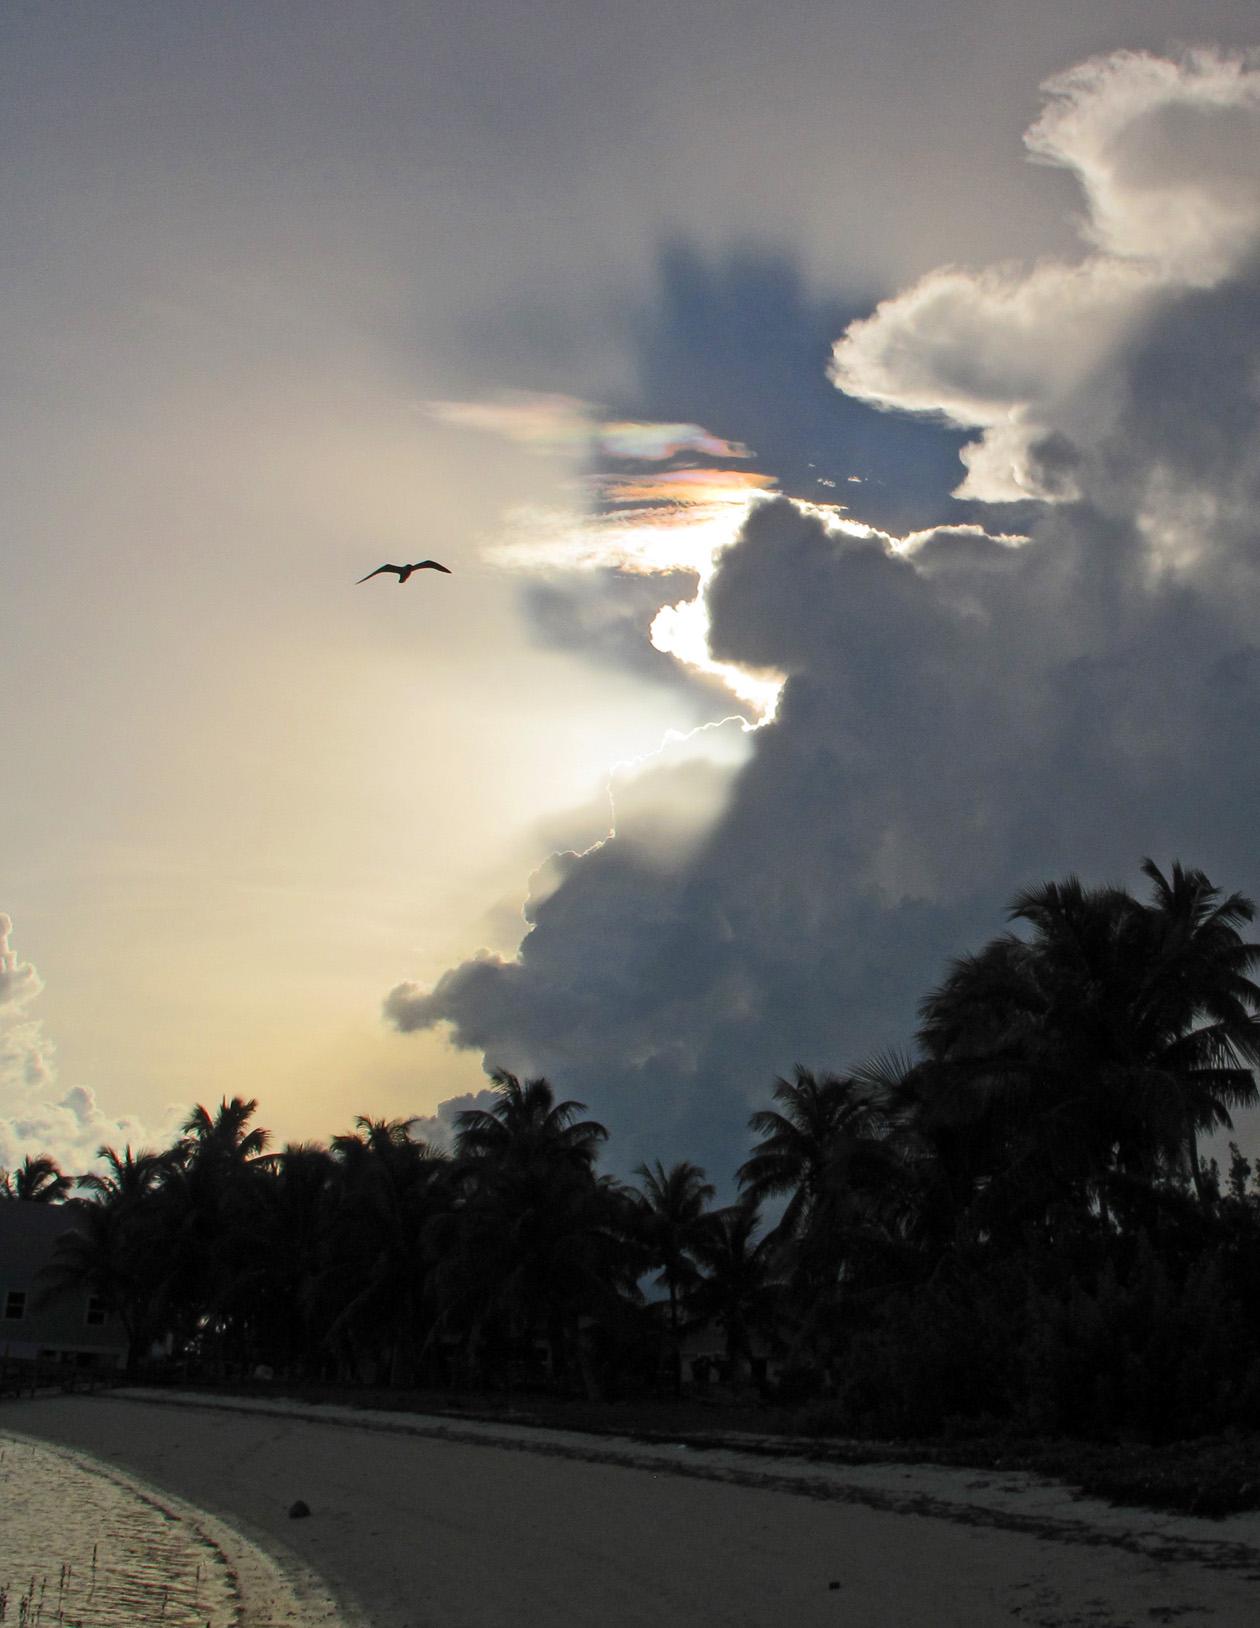 bahamas, abaco, green turtle cay, south beach